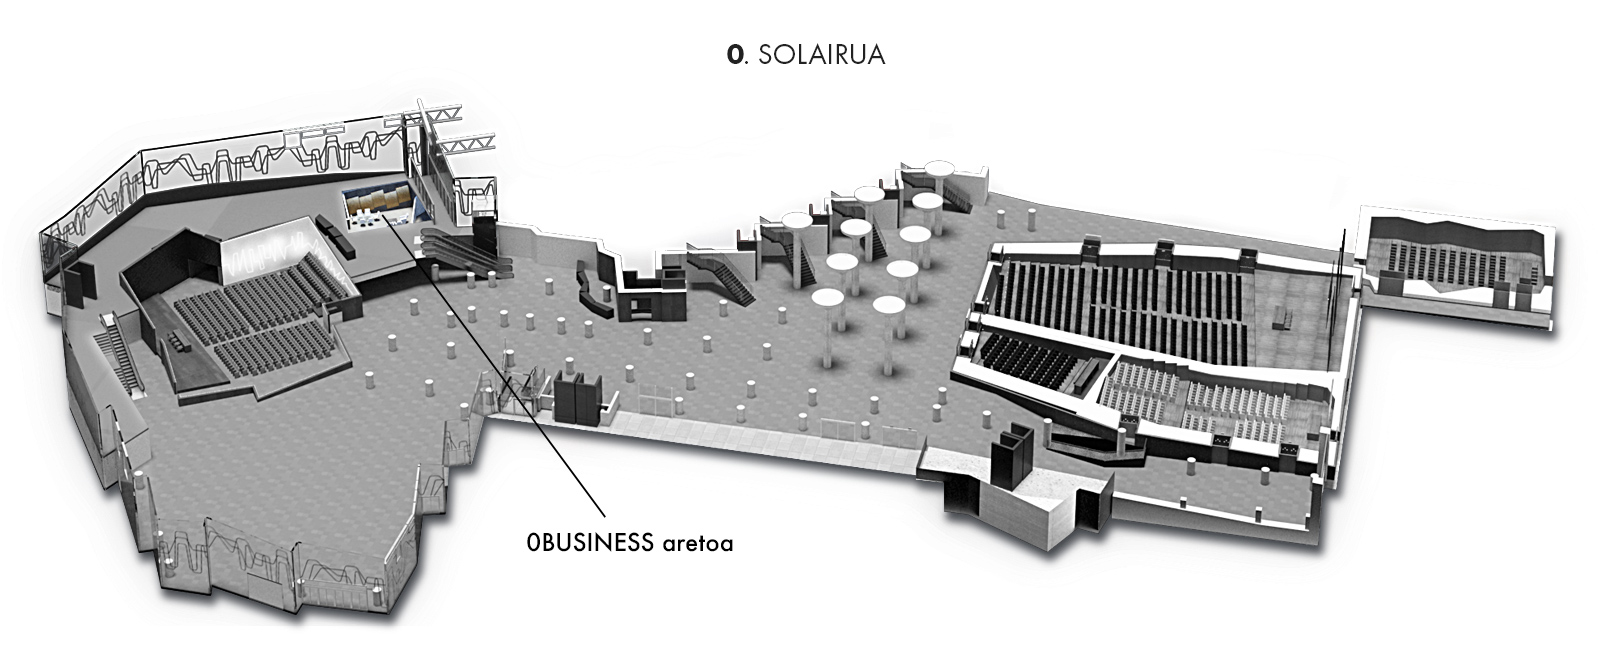 0BUSINESS aretoa, 0. solairua | Palacio Euskalduna Jauregia